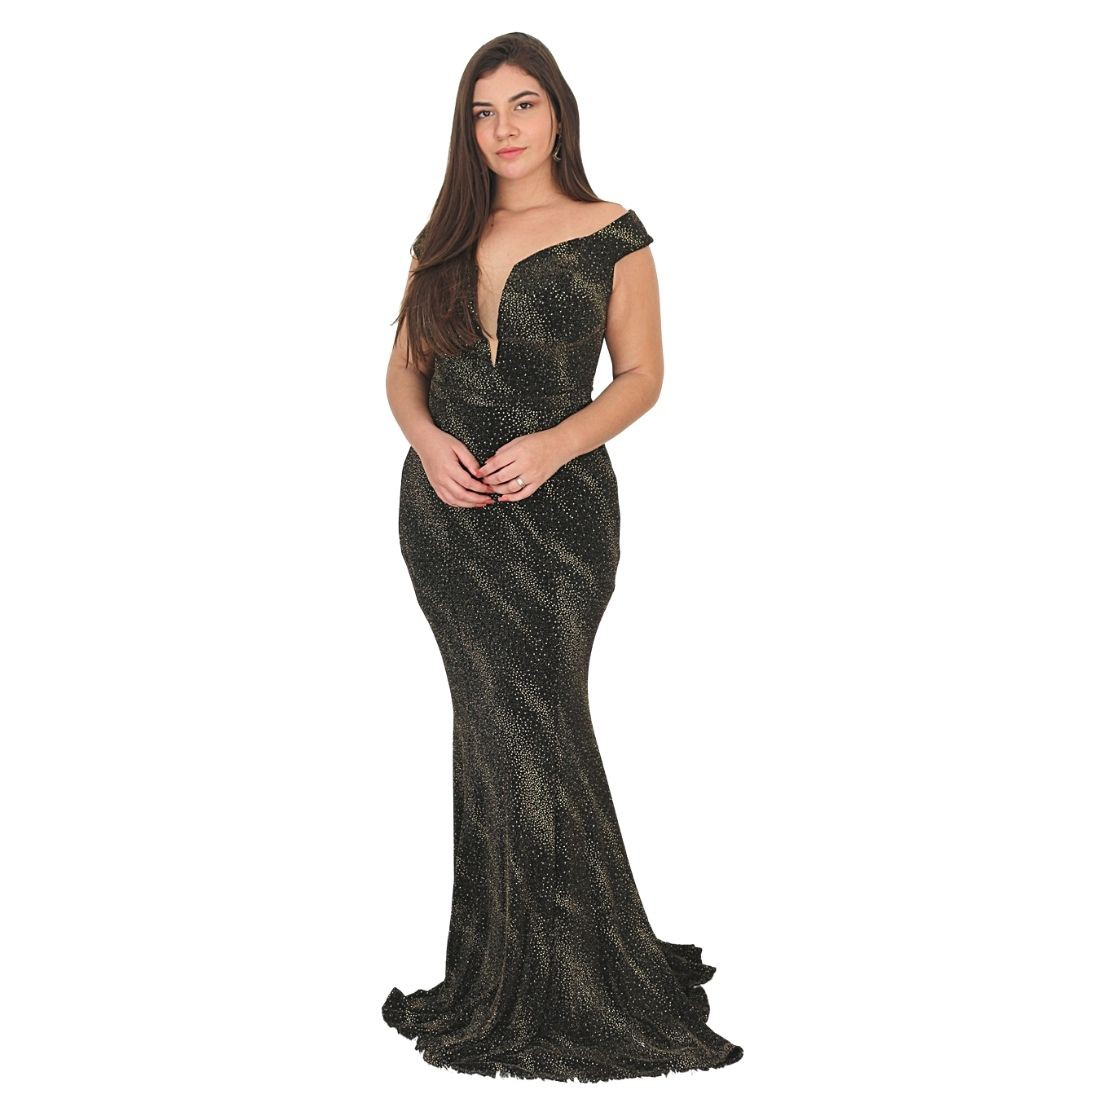 Vestido de Festa Preto Marsala Longo c/ Brilho 15 Anos Casamento Civil